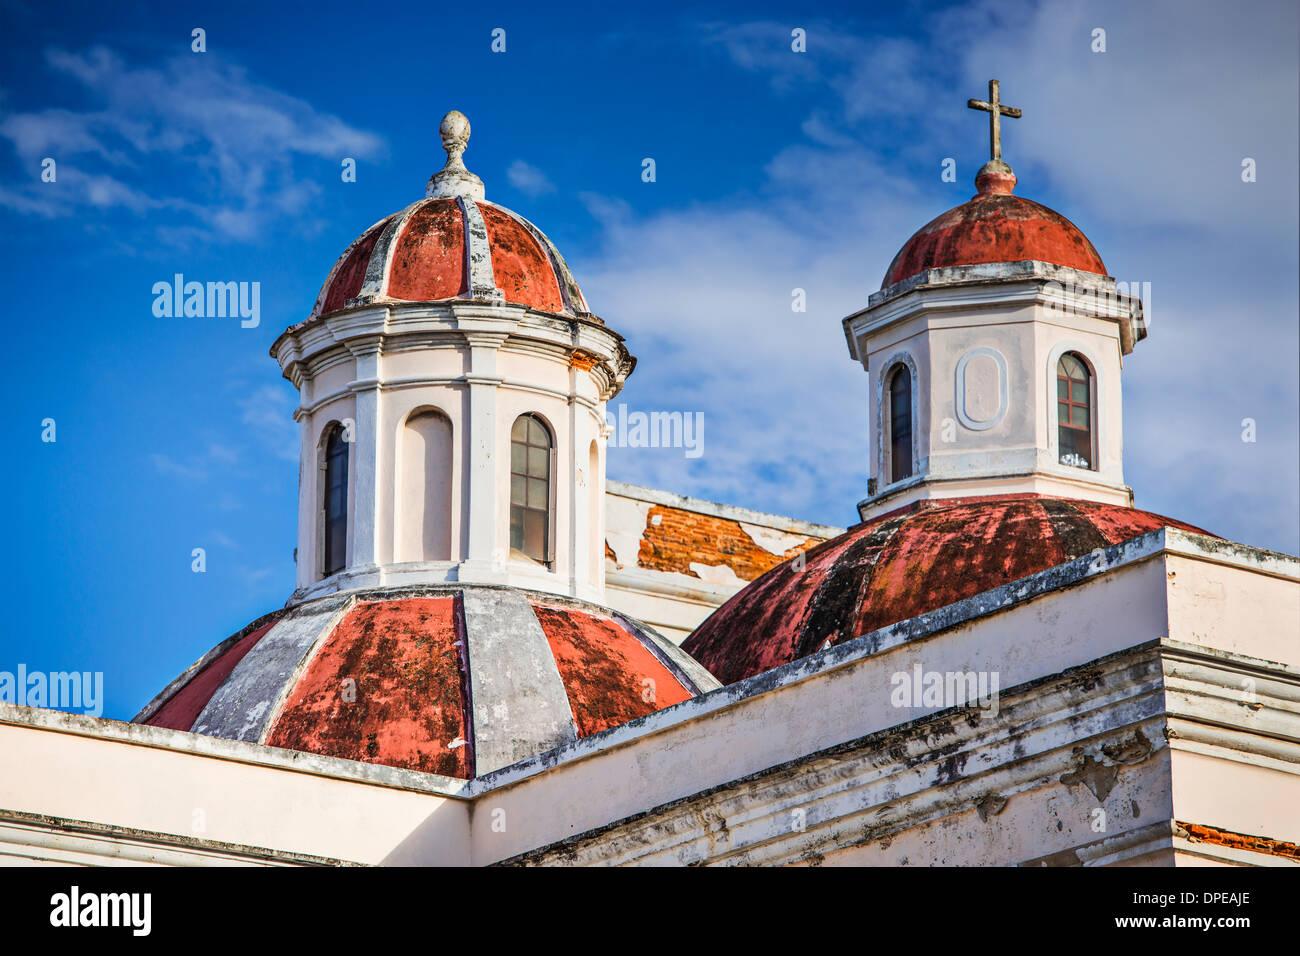 Cathedral of San Juan Bautista in San Jaun, Puerto Rico. - Stock Image